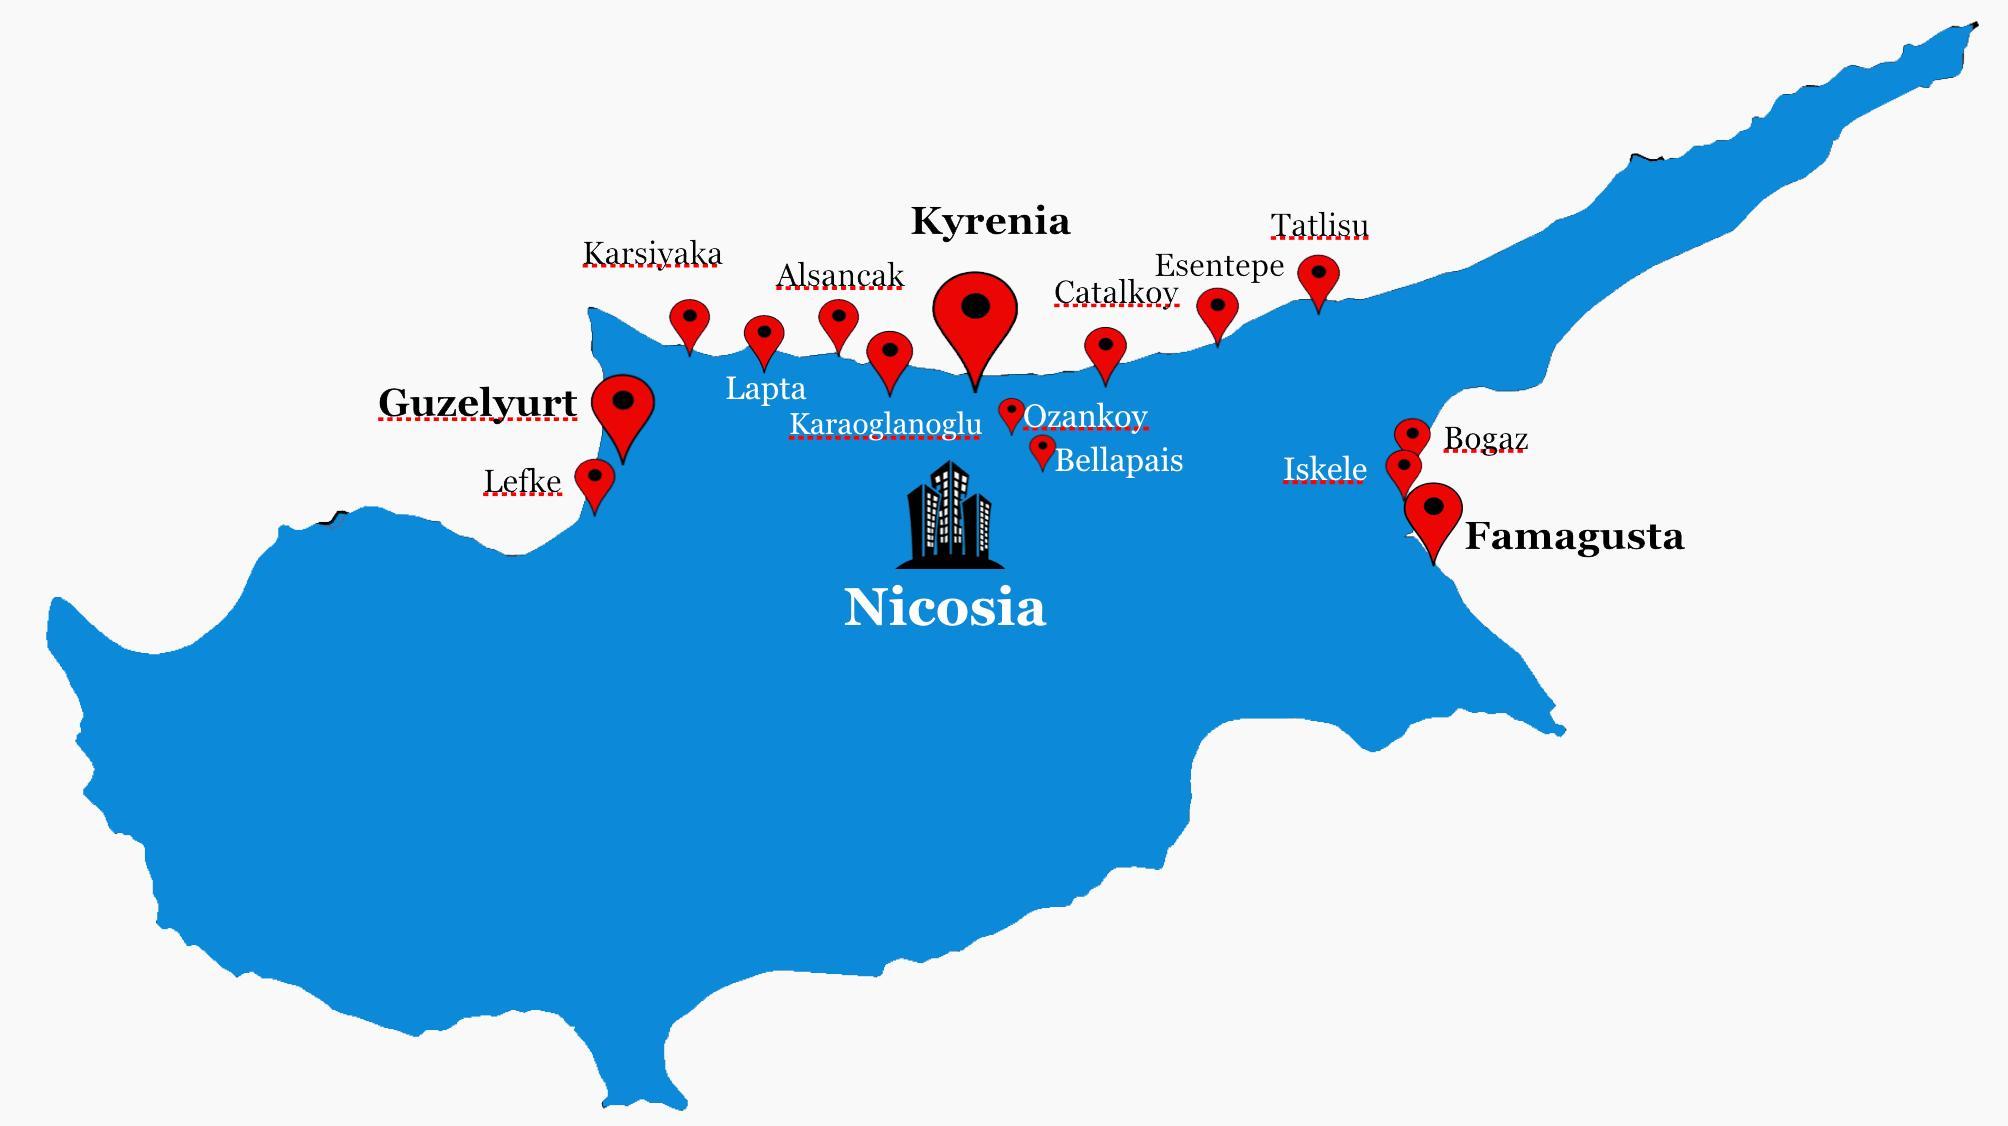 Karta Famagusta Cypern.Norra Cypern Karta Norra Cypern Fardplan Sodra Europa Europa